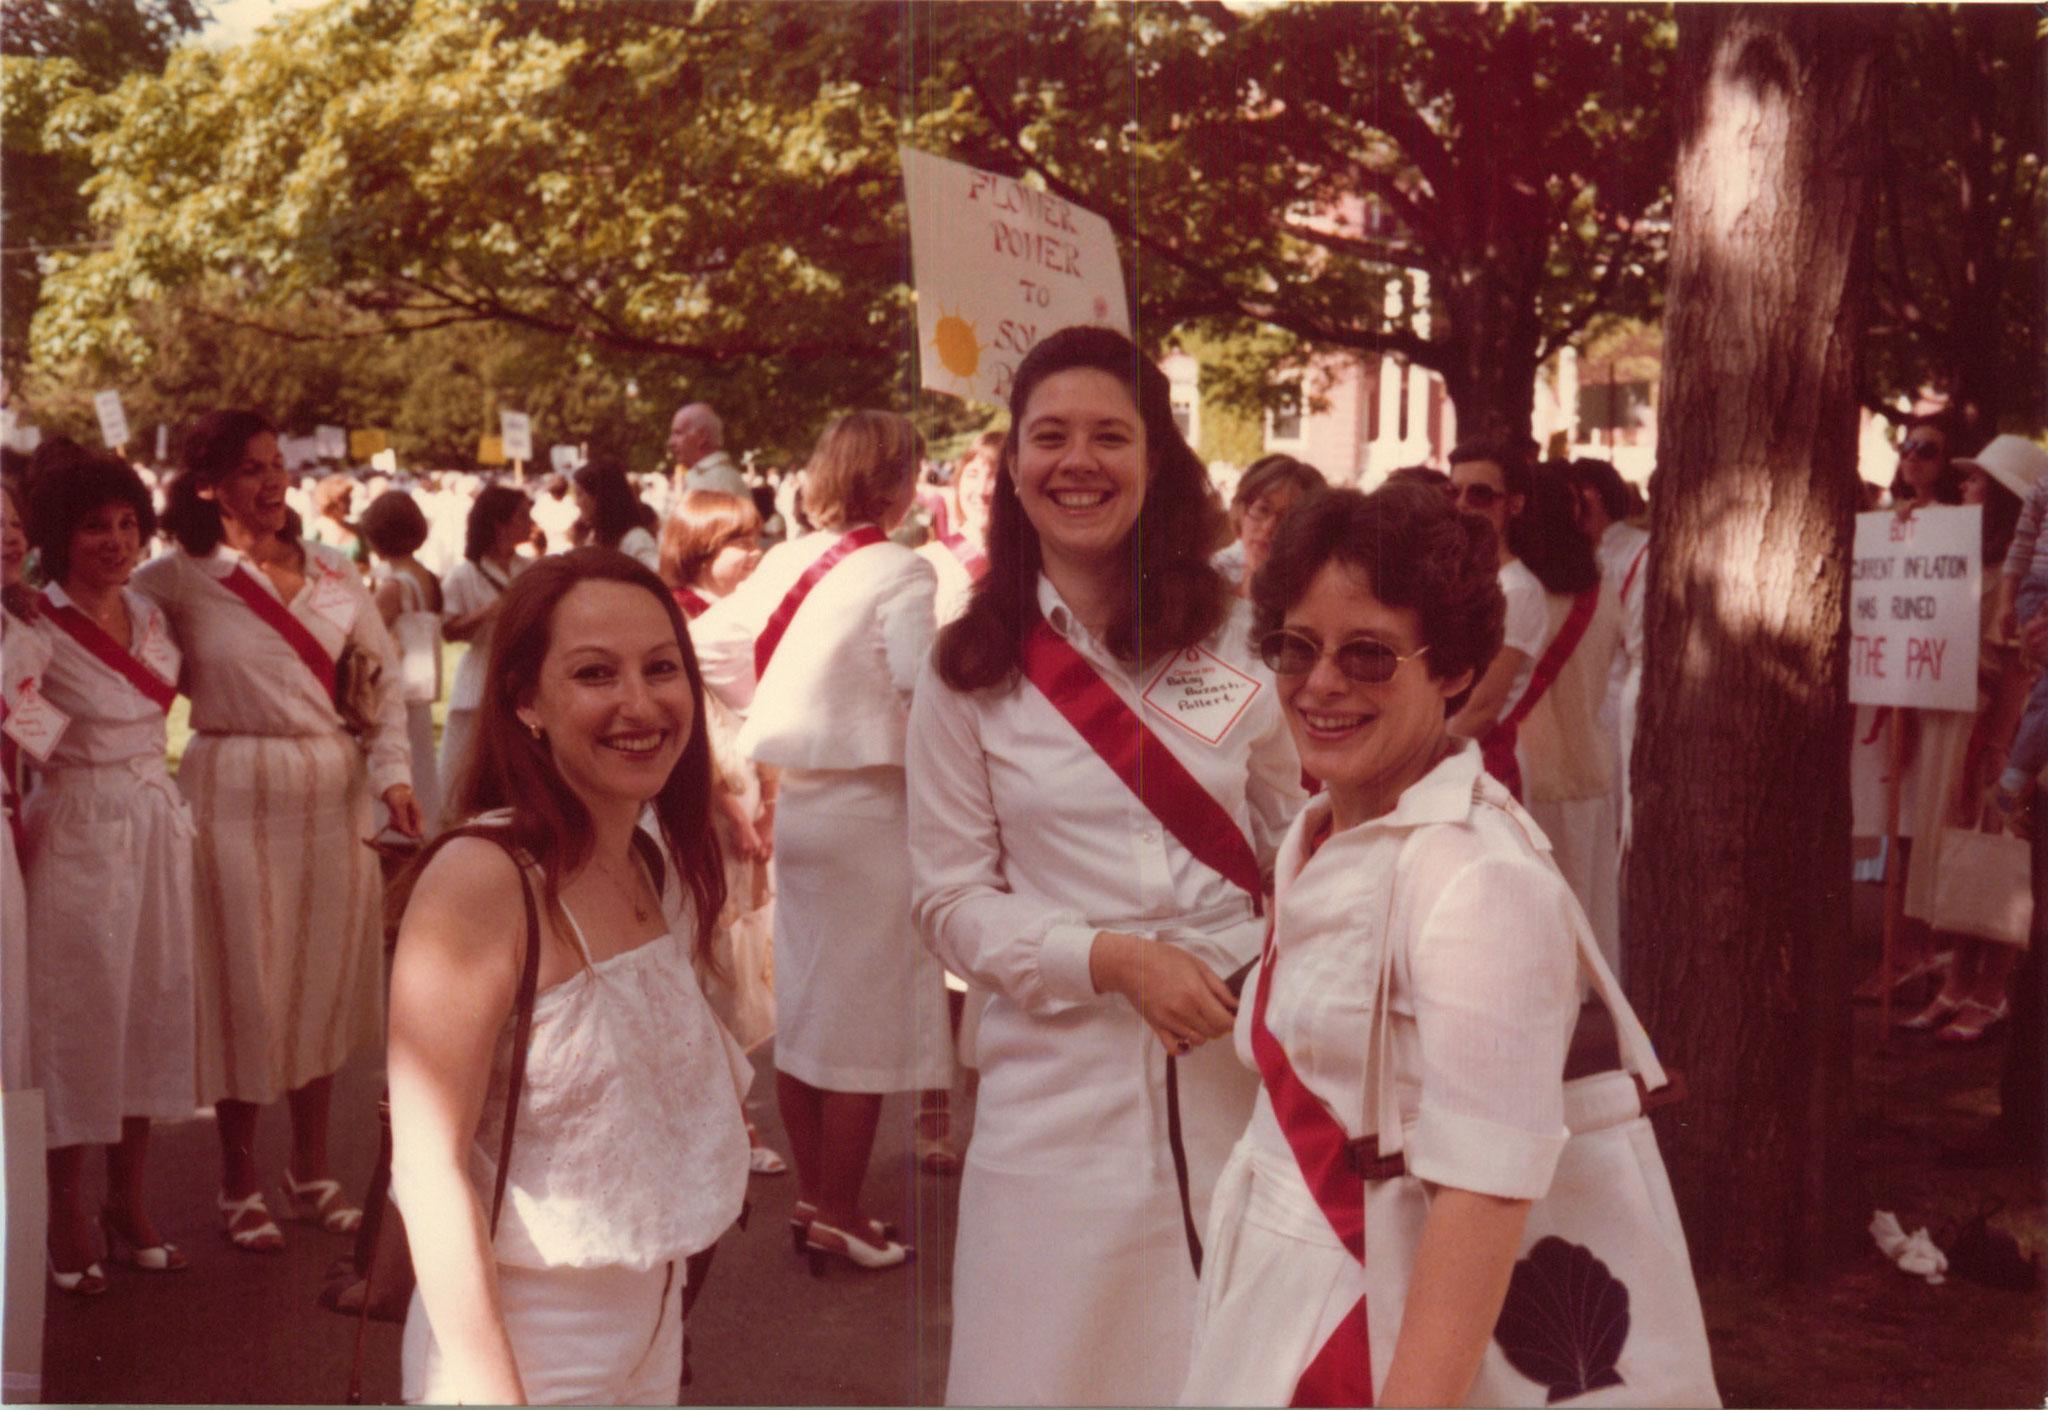 Sherry Lichtenberg, Betsy Buzash, & Elizabeth Singer Maule